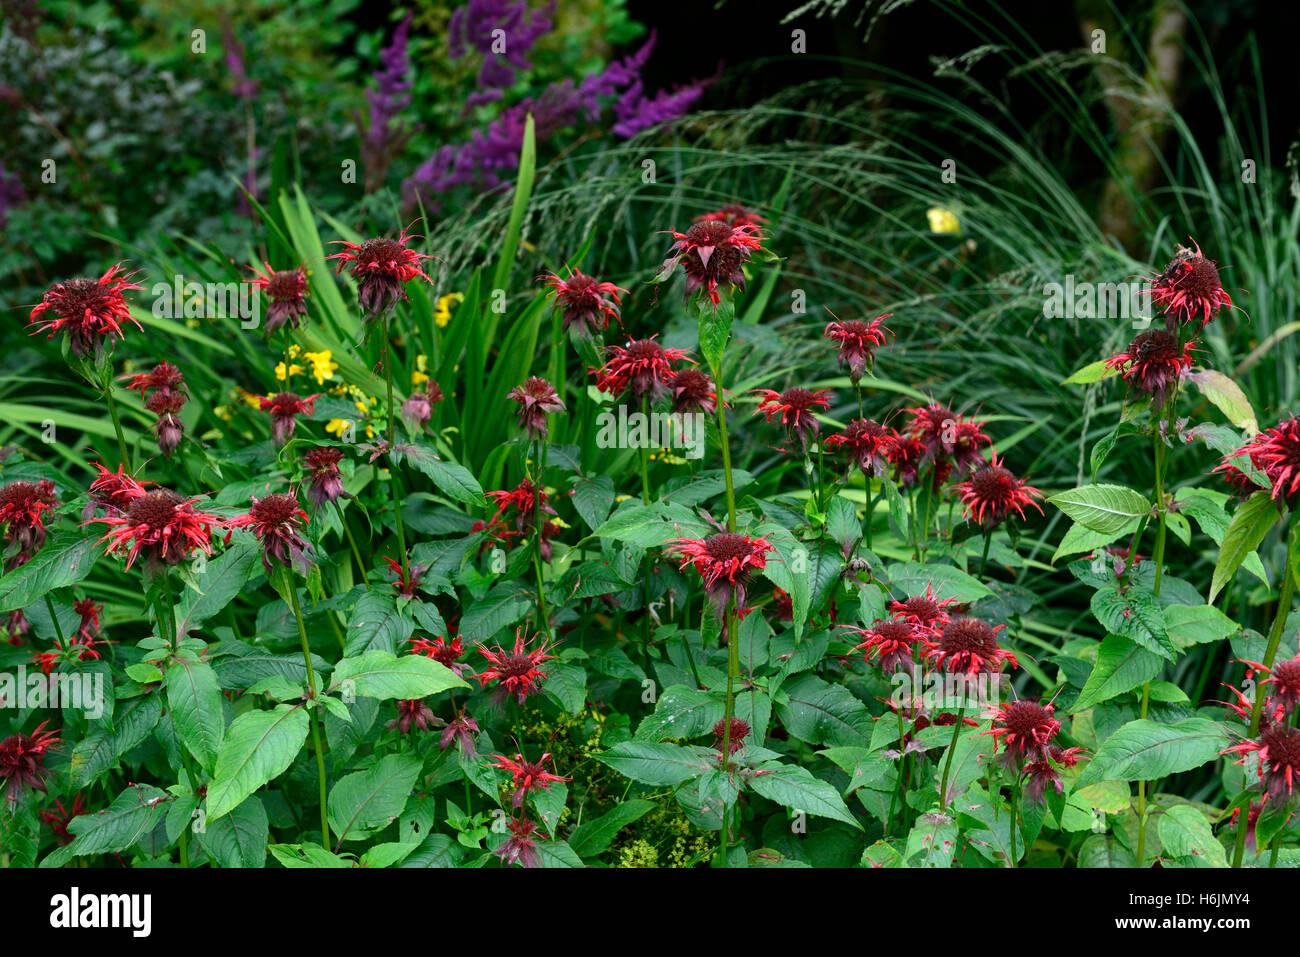 monarda didyma adam Bee Balm bergamot red scarlet flowers flower flowering perennial perennials RM Floral - Stock Image